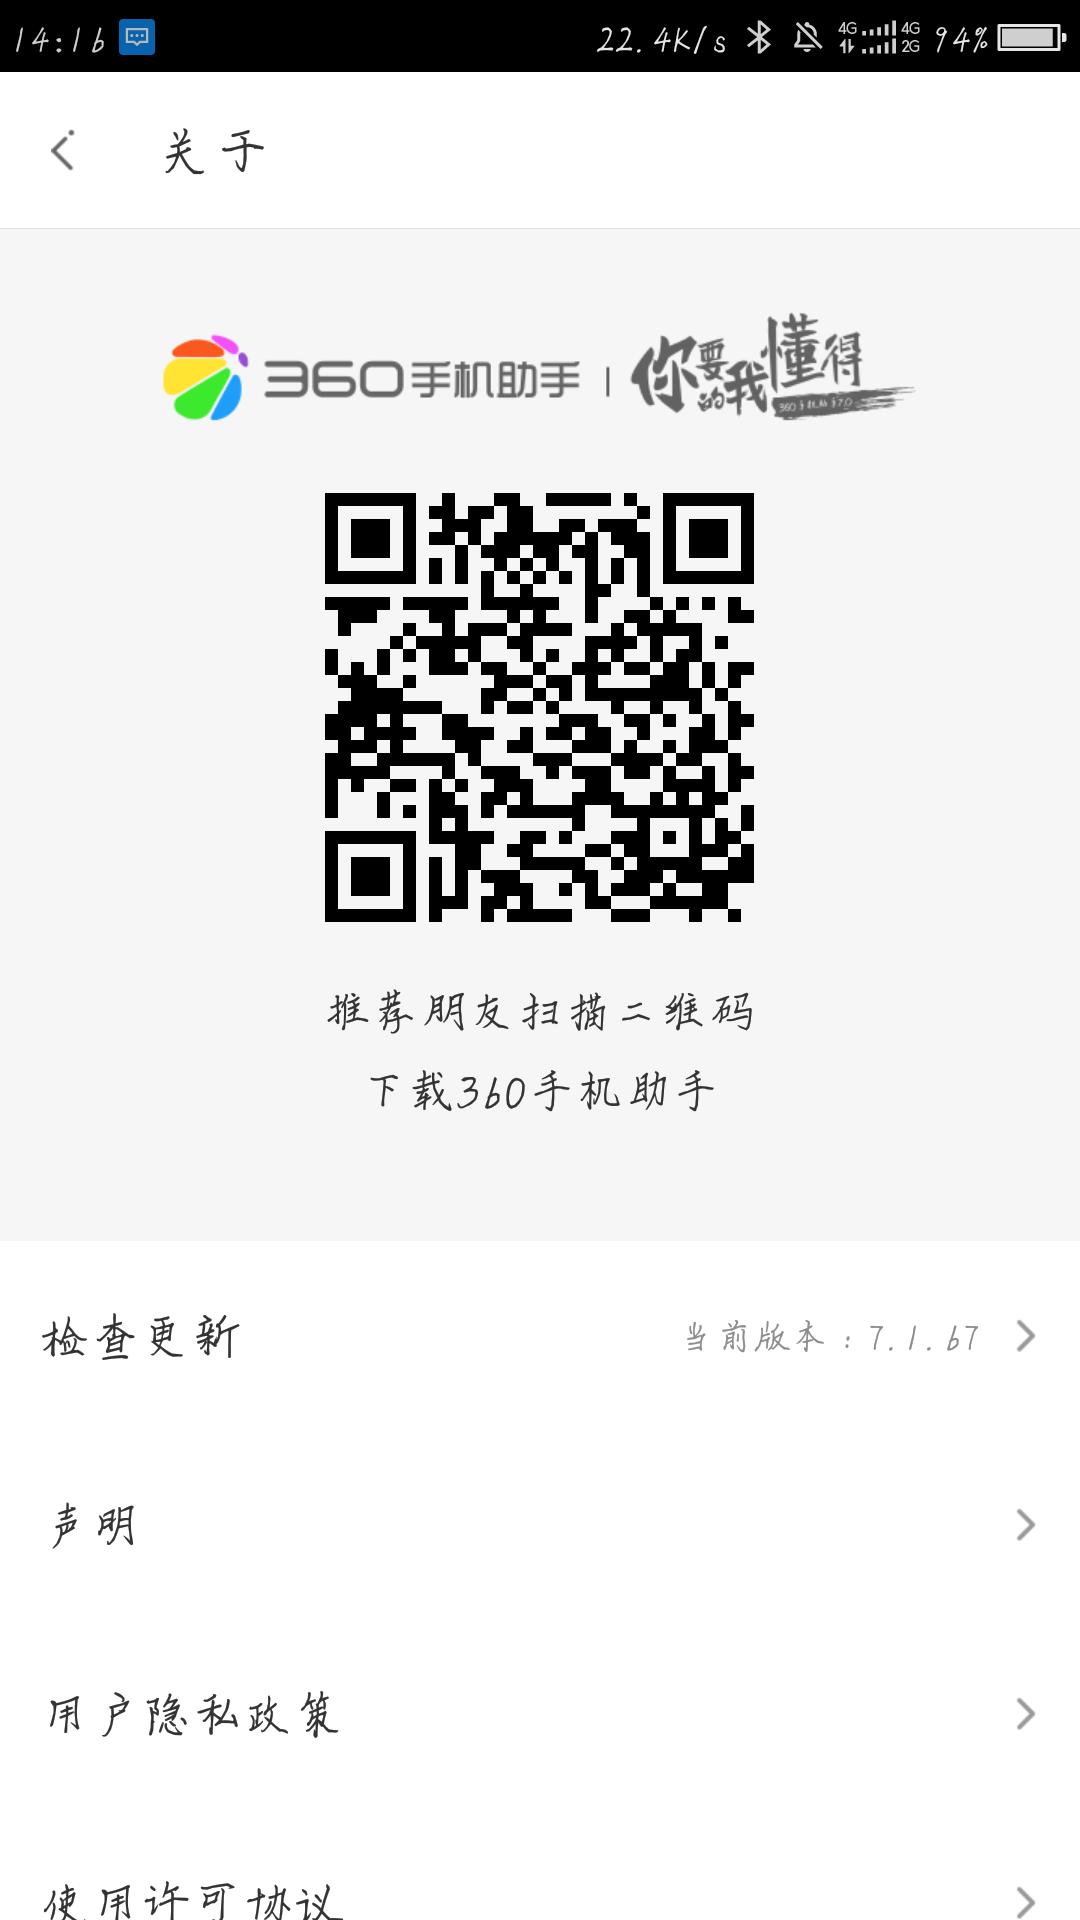 Screenshot_2019-01-30-14-16-36.png